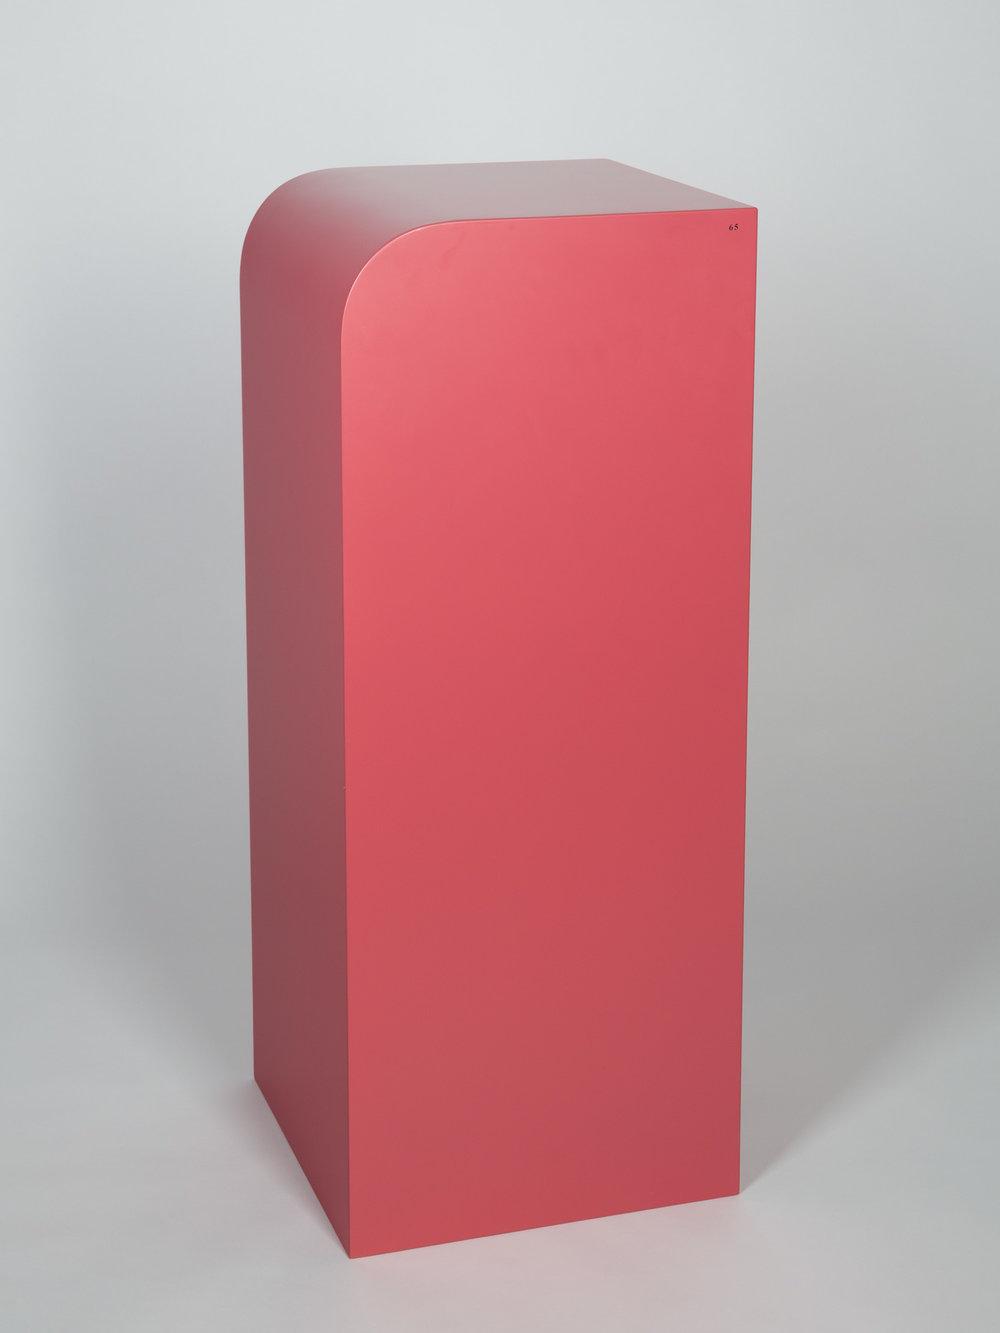 Runde Ecke , 2014  glazed ceramic  100 × 40 × 40 cm